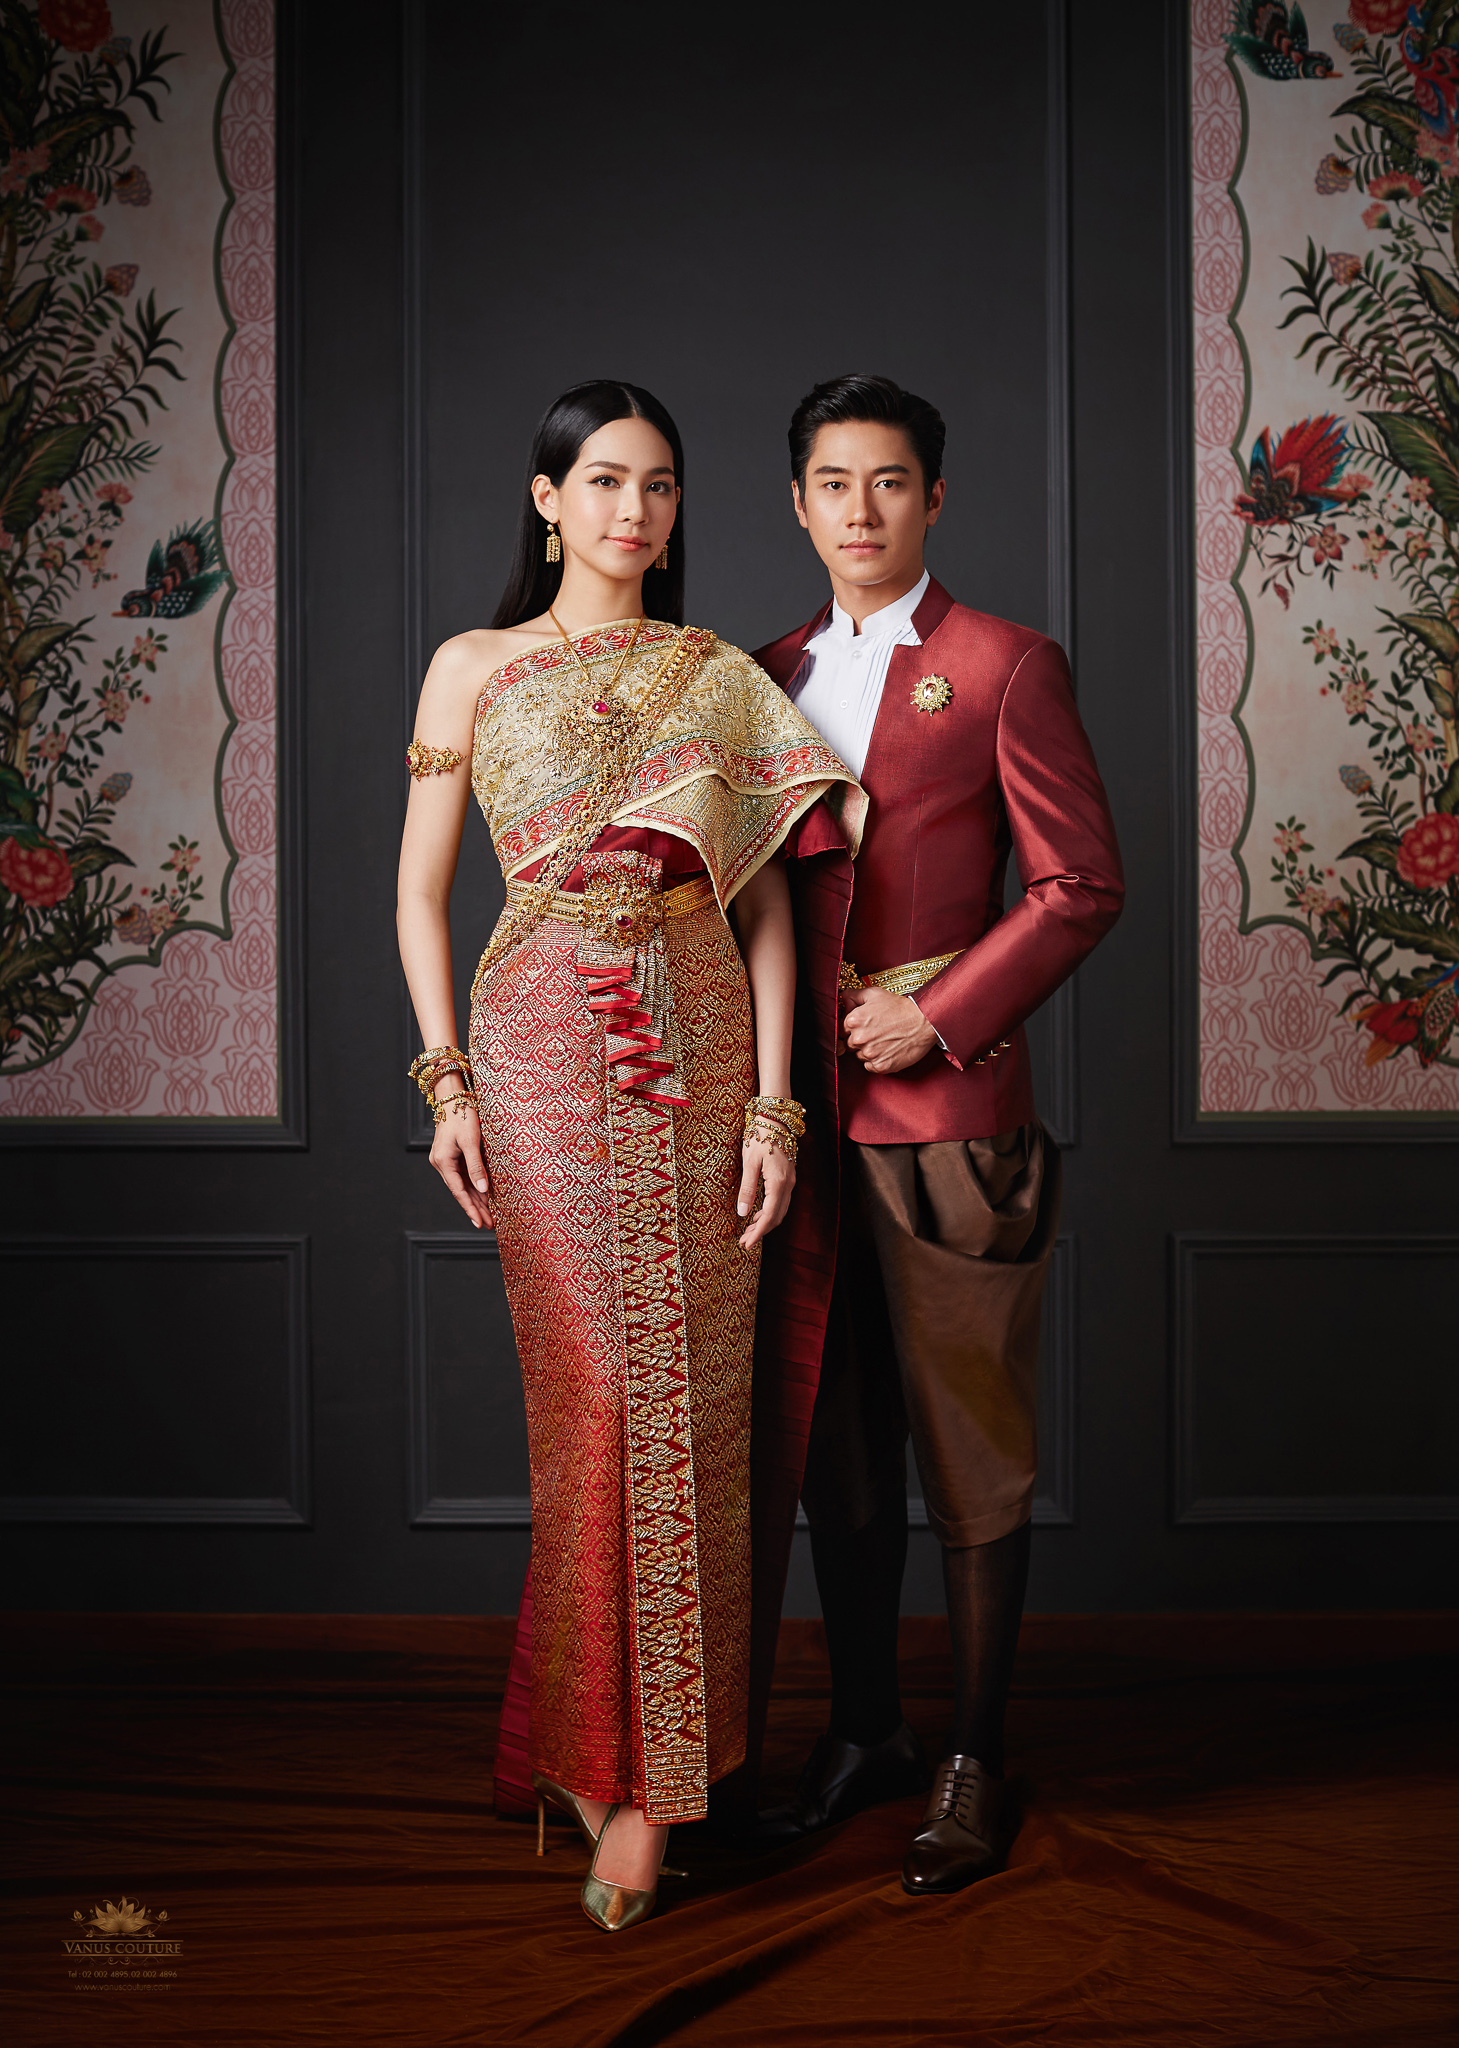 Thai traditional dress - Bint 01